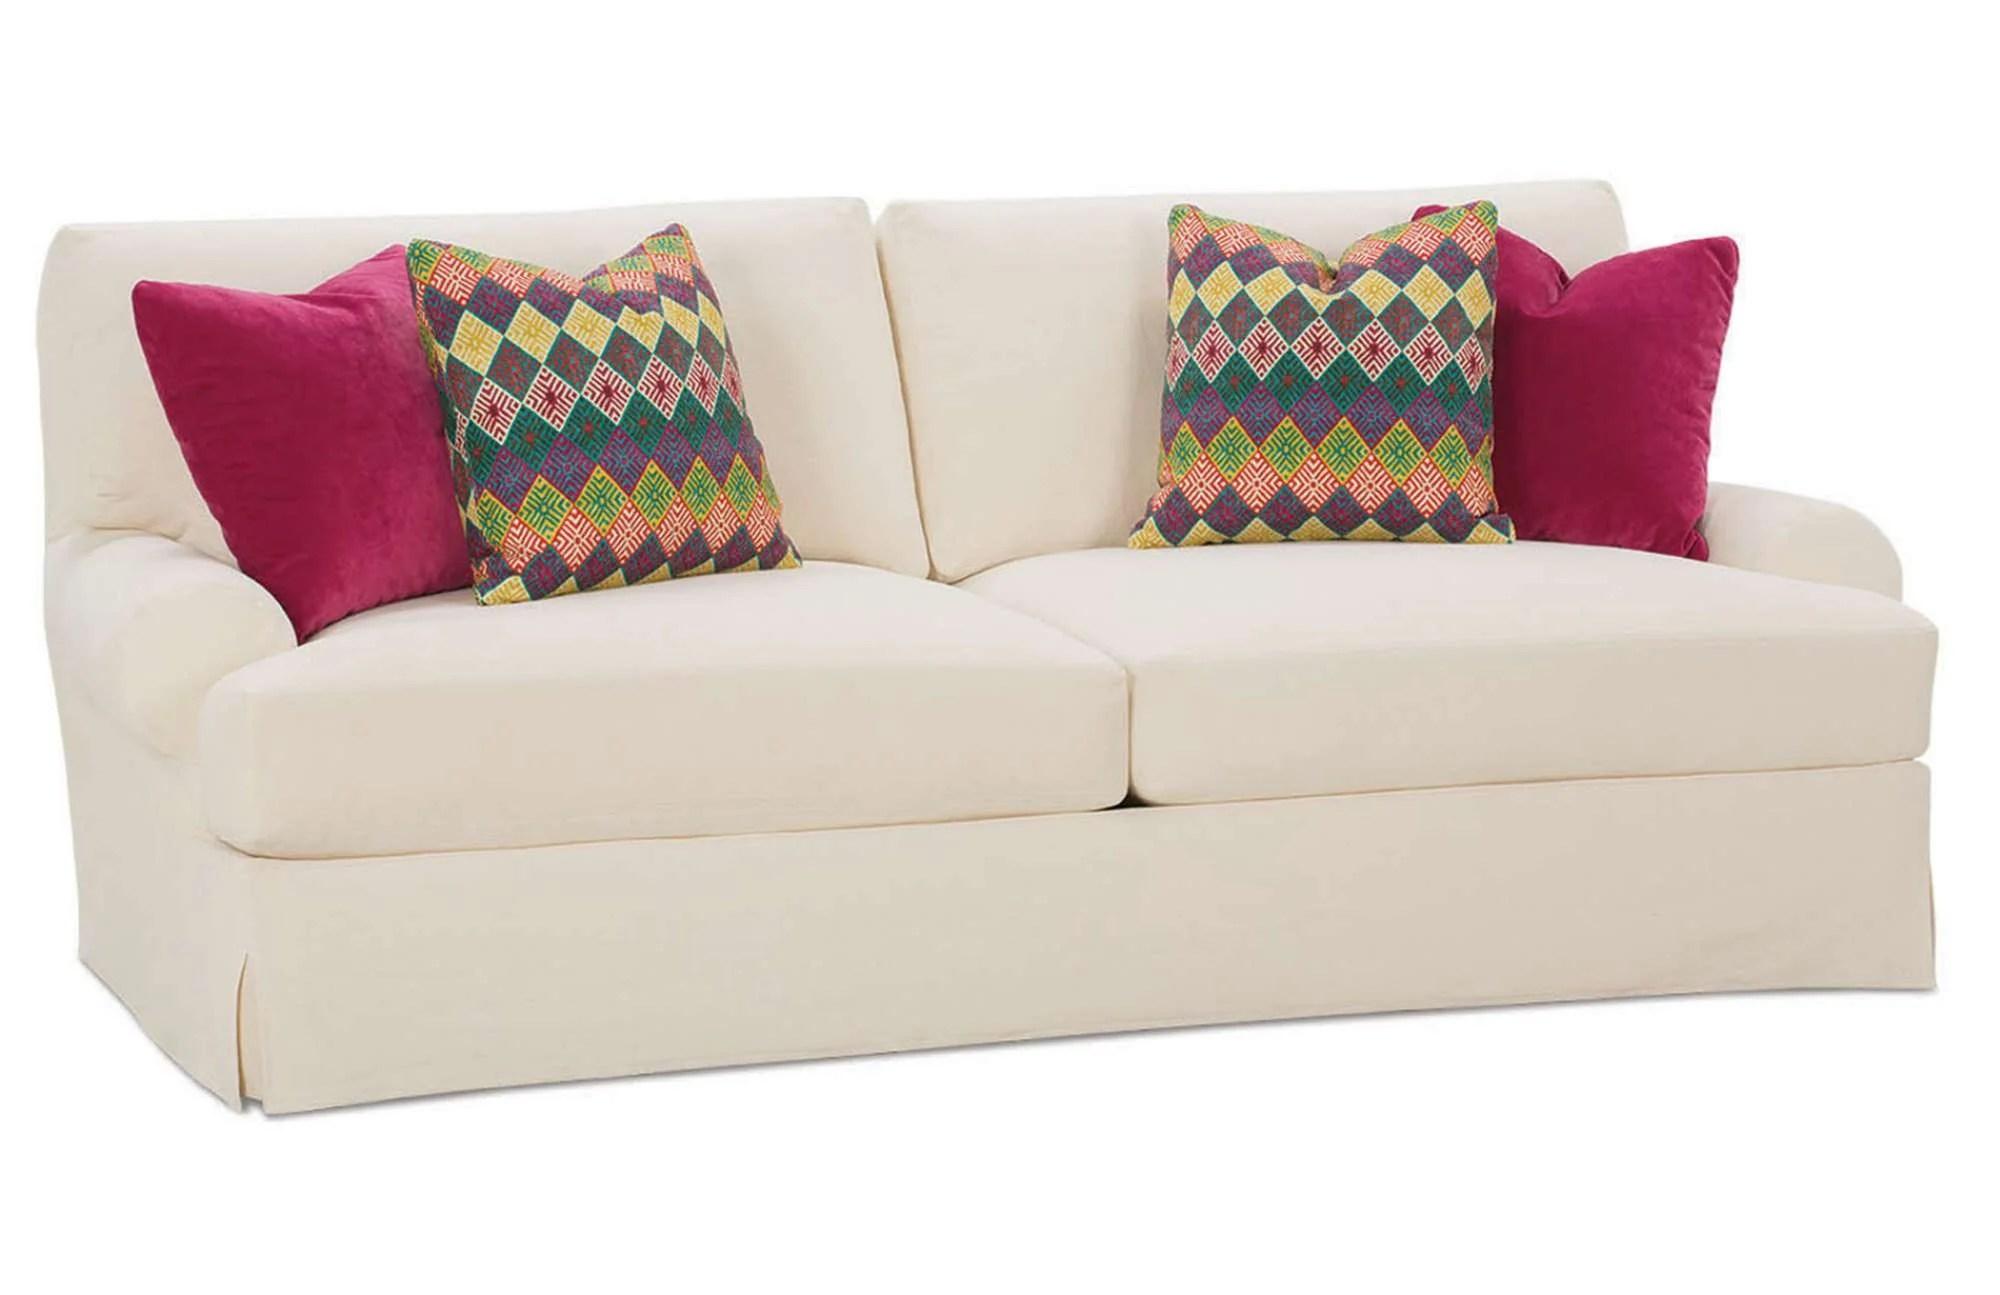 slipcovers for sofa beds sectional sofas virginia beach kagan s home rowe branson slipcover